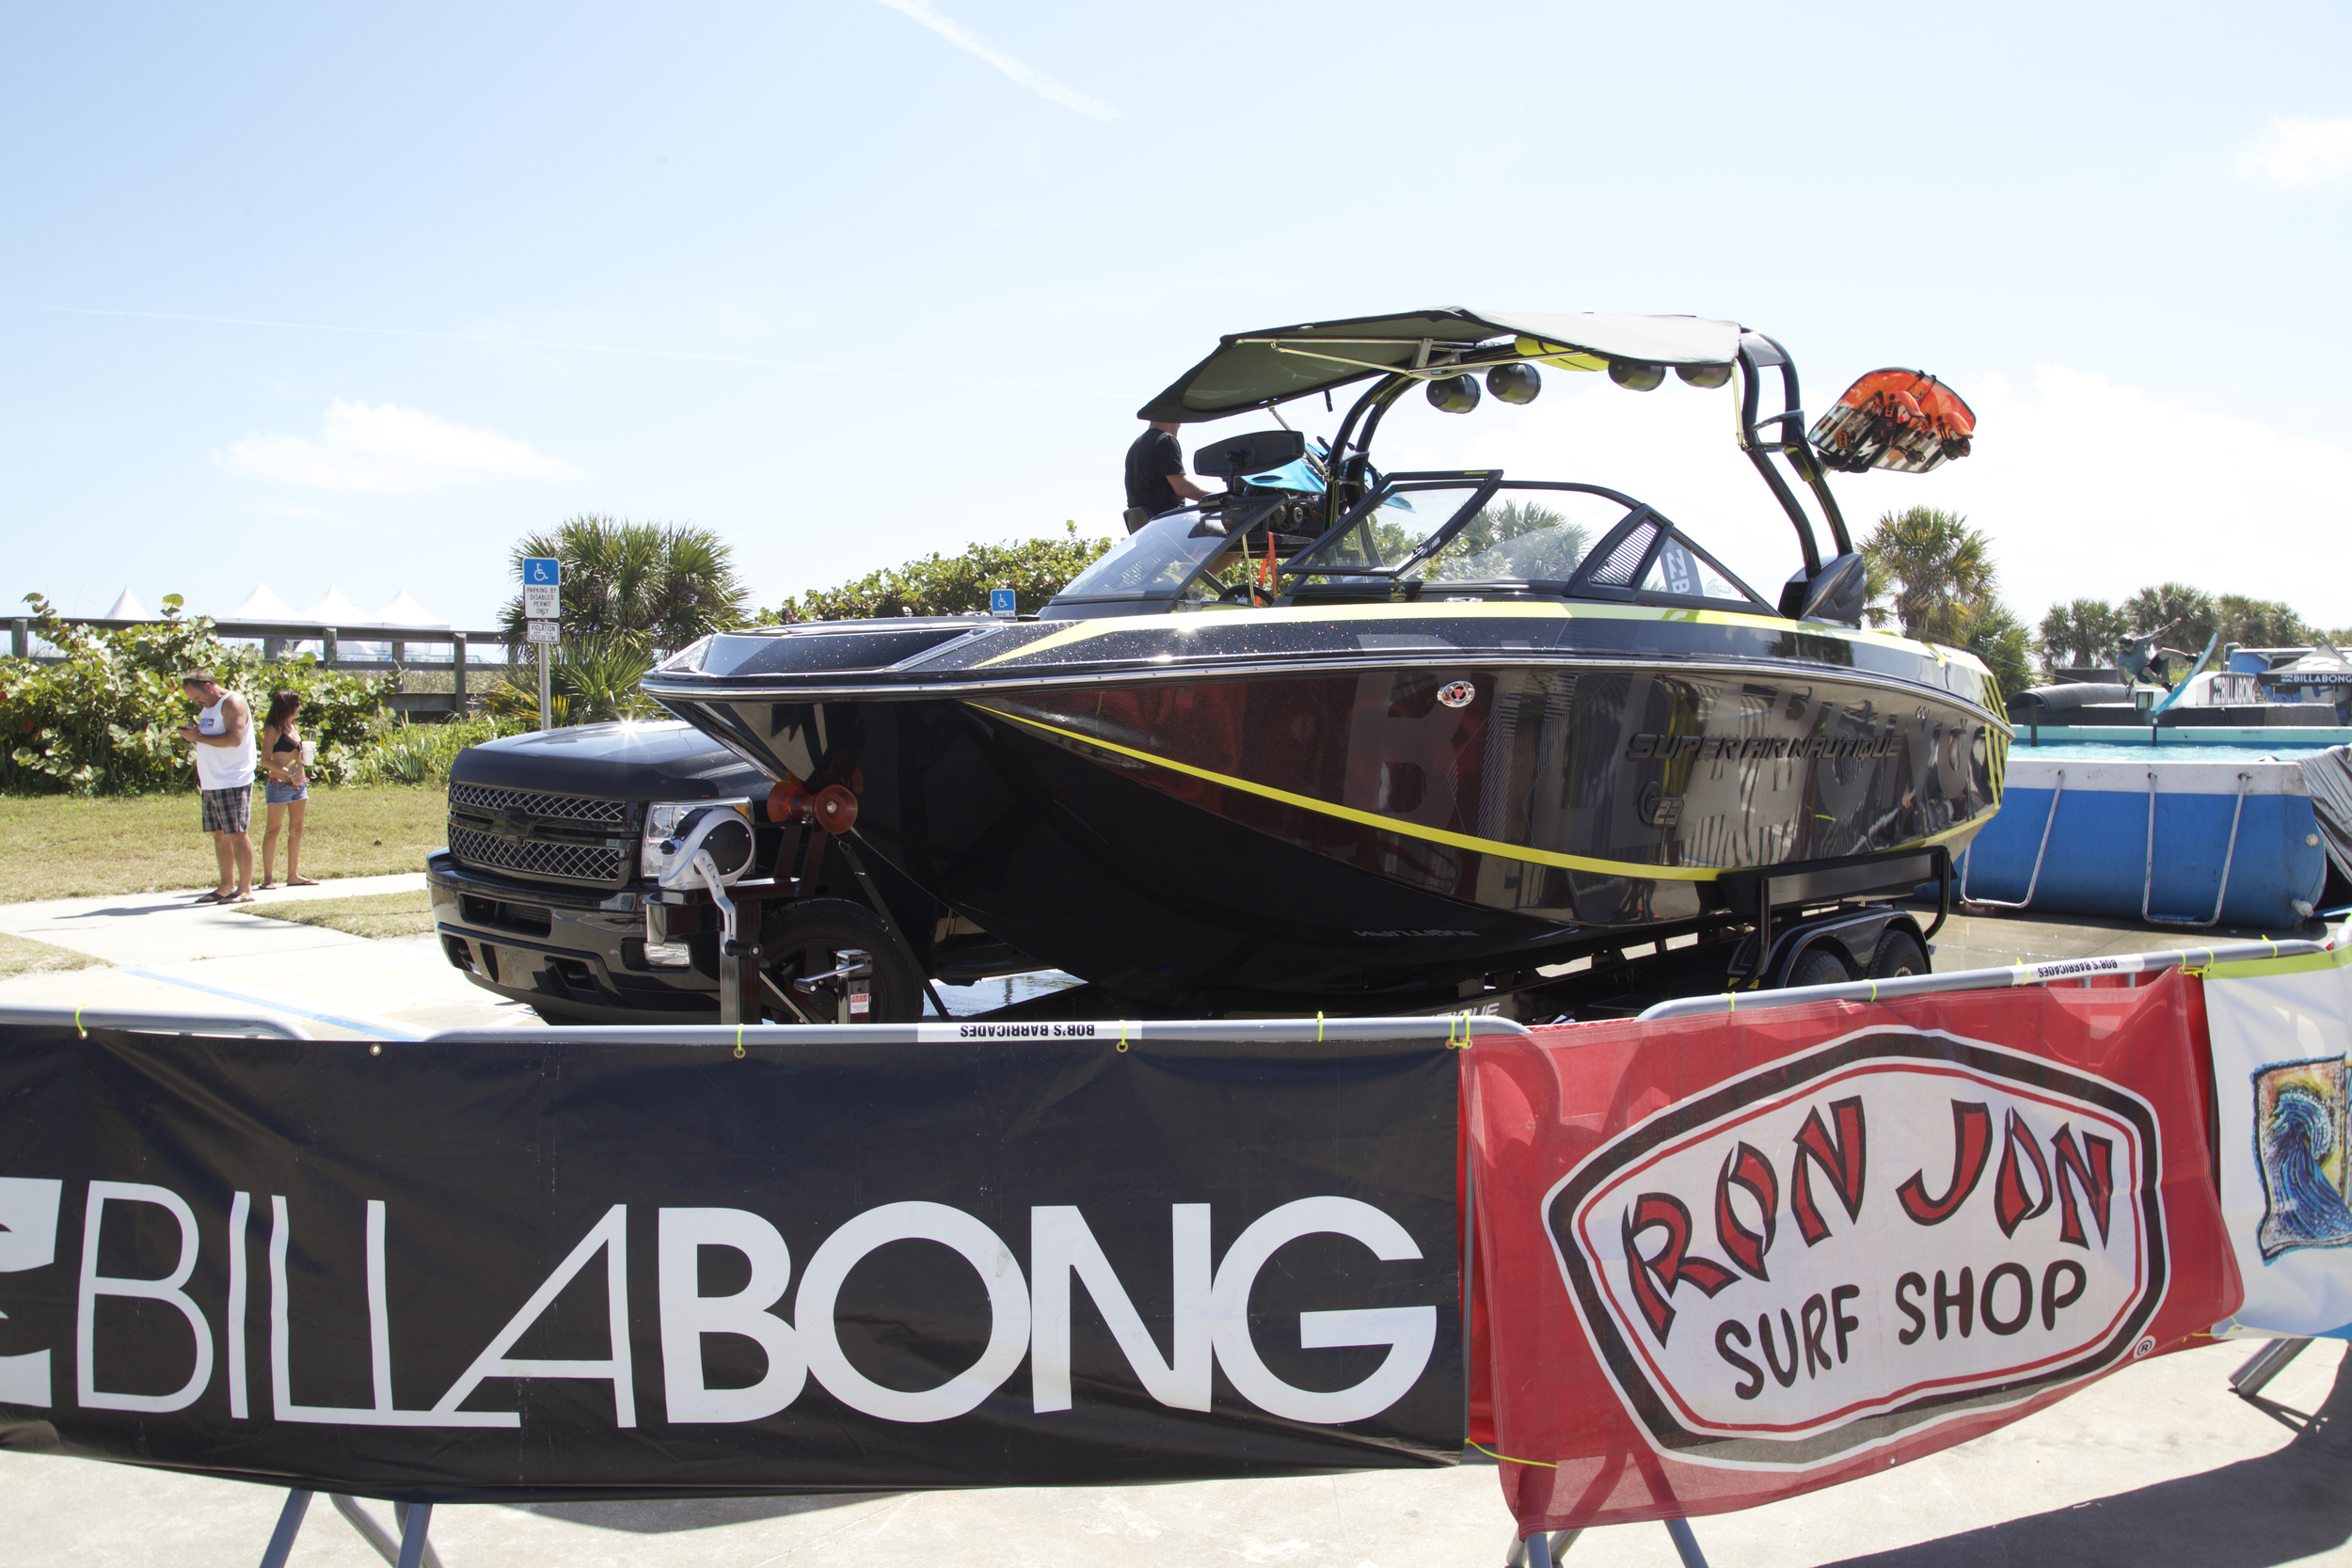 Billabong Boat.jpg